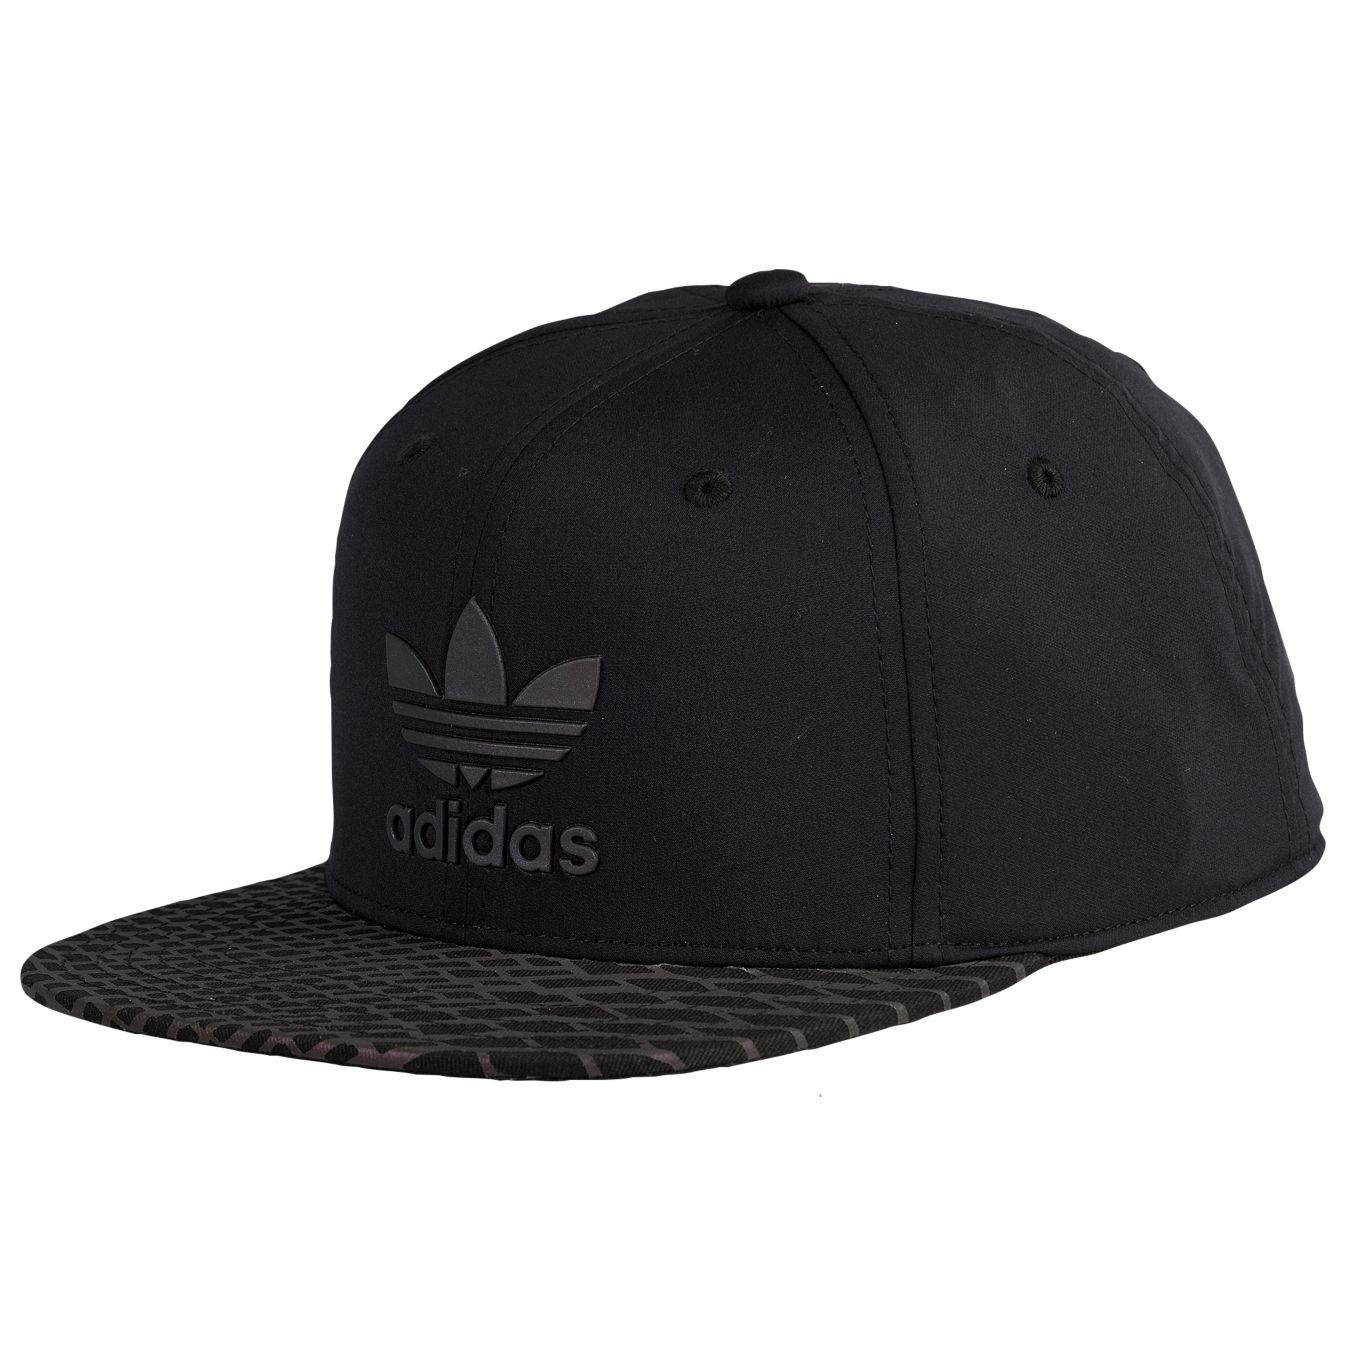 Shopandbox Buy Adidas Originals Americana Snapback Cap Mens From Us